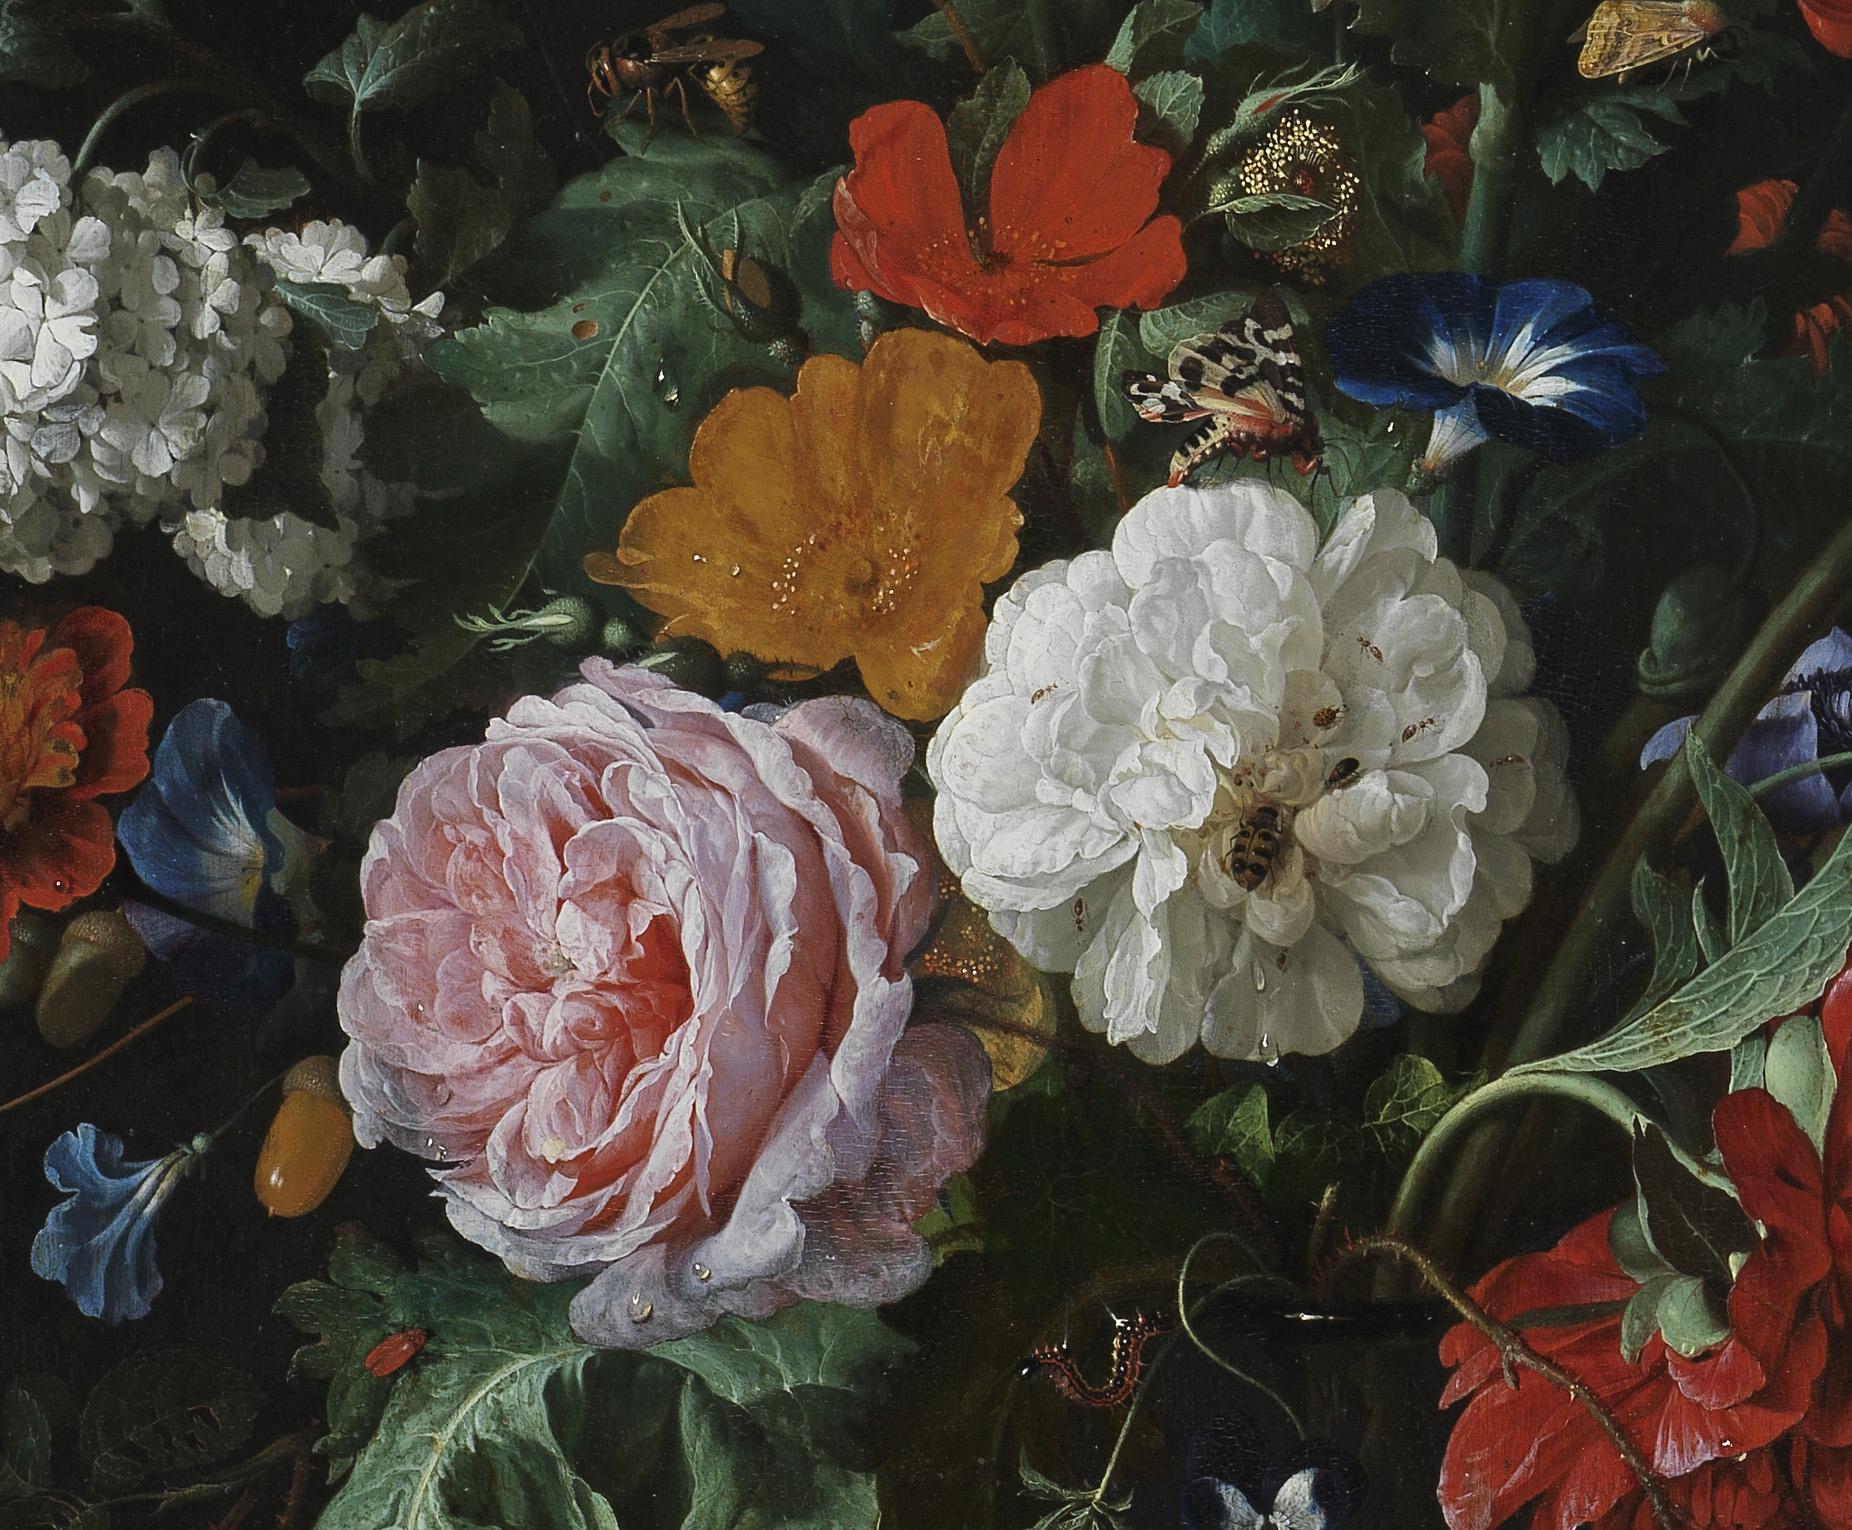 Detail from Flowers in a Glass Vase, by Jan Davidsz. de Heem (c) The Fitzwilliam Museum